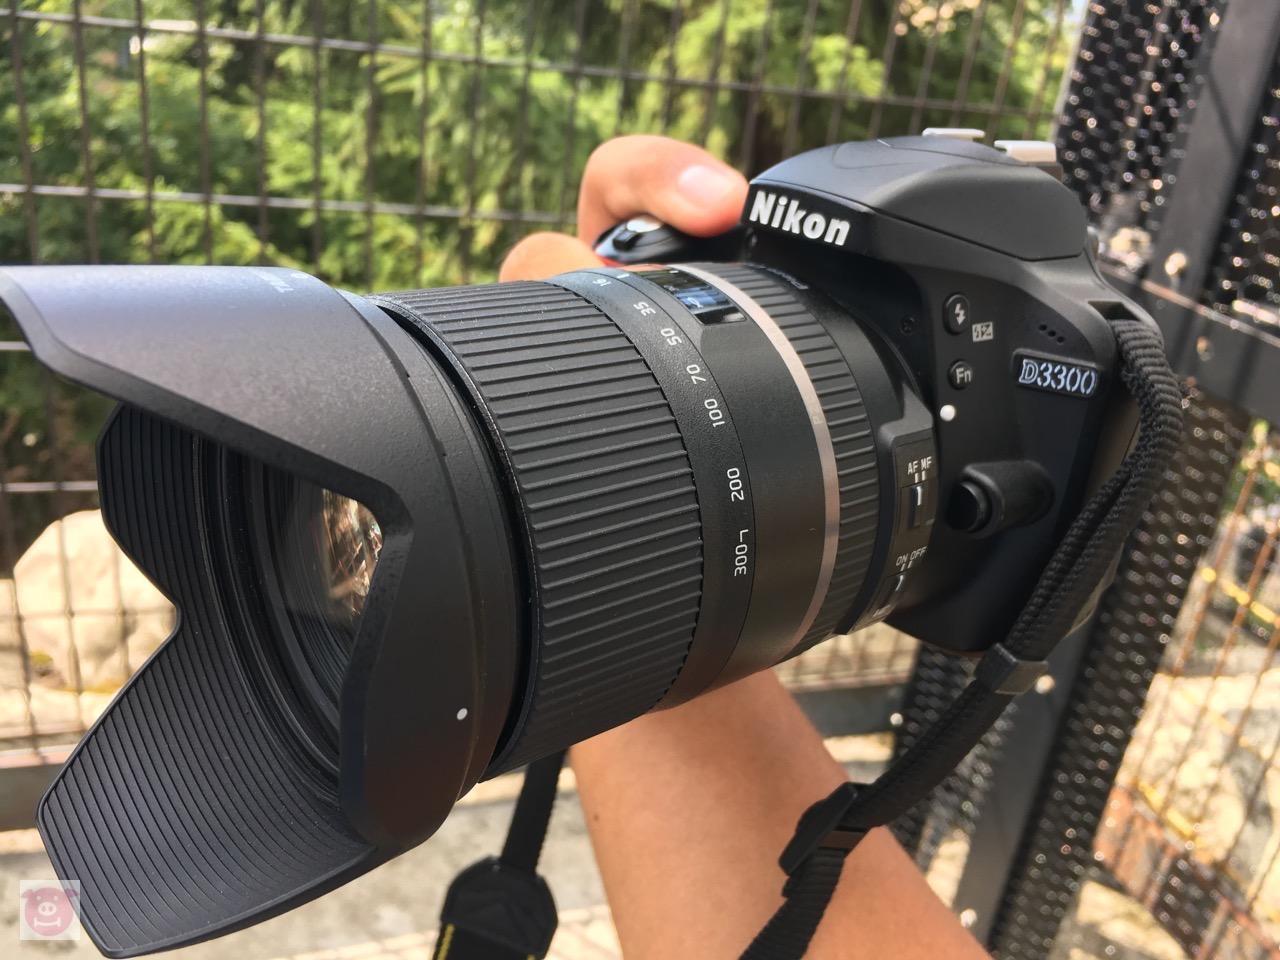 16-300mm - 1